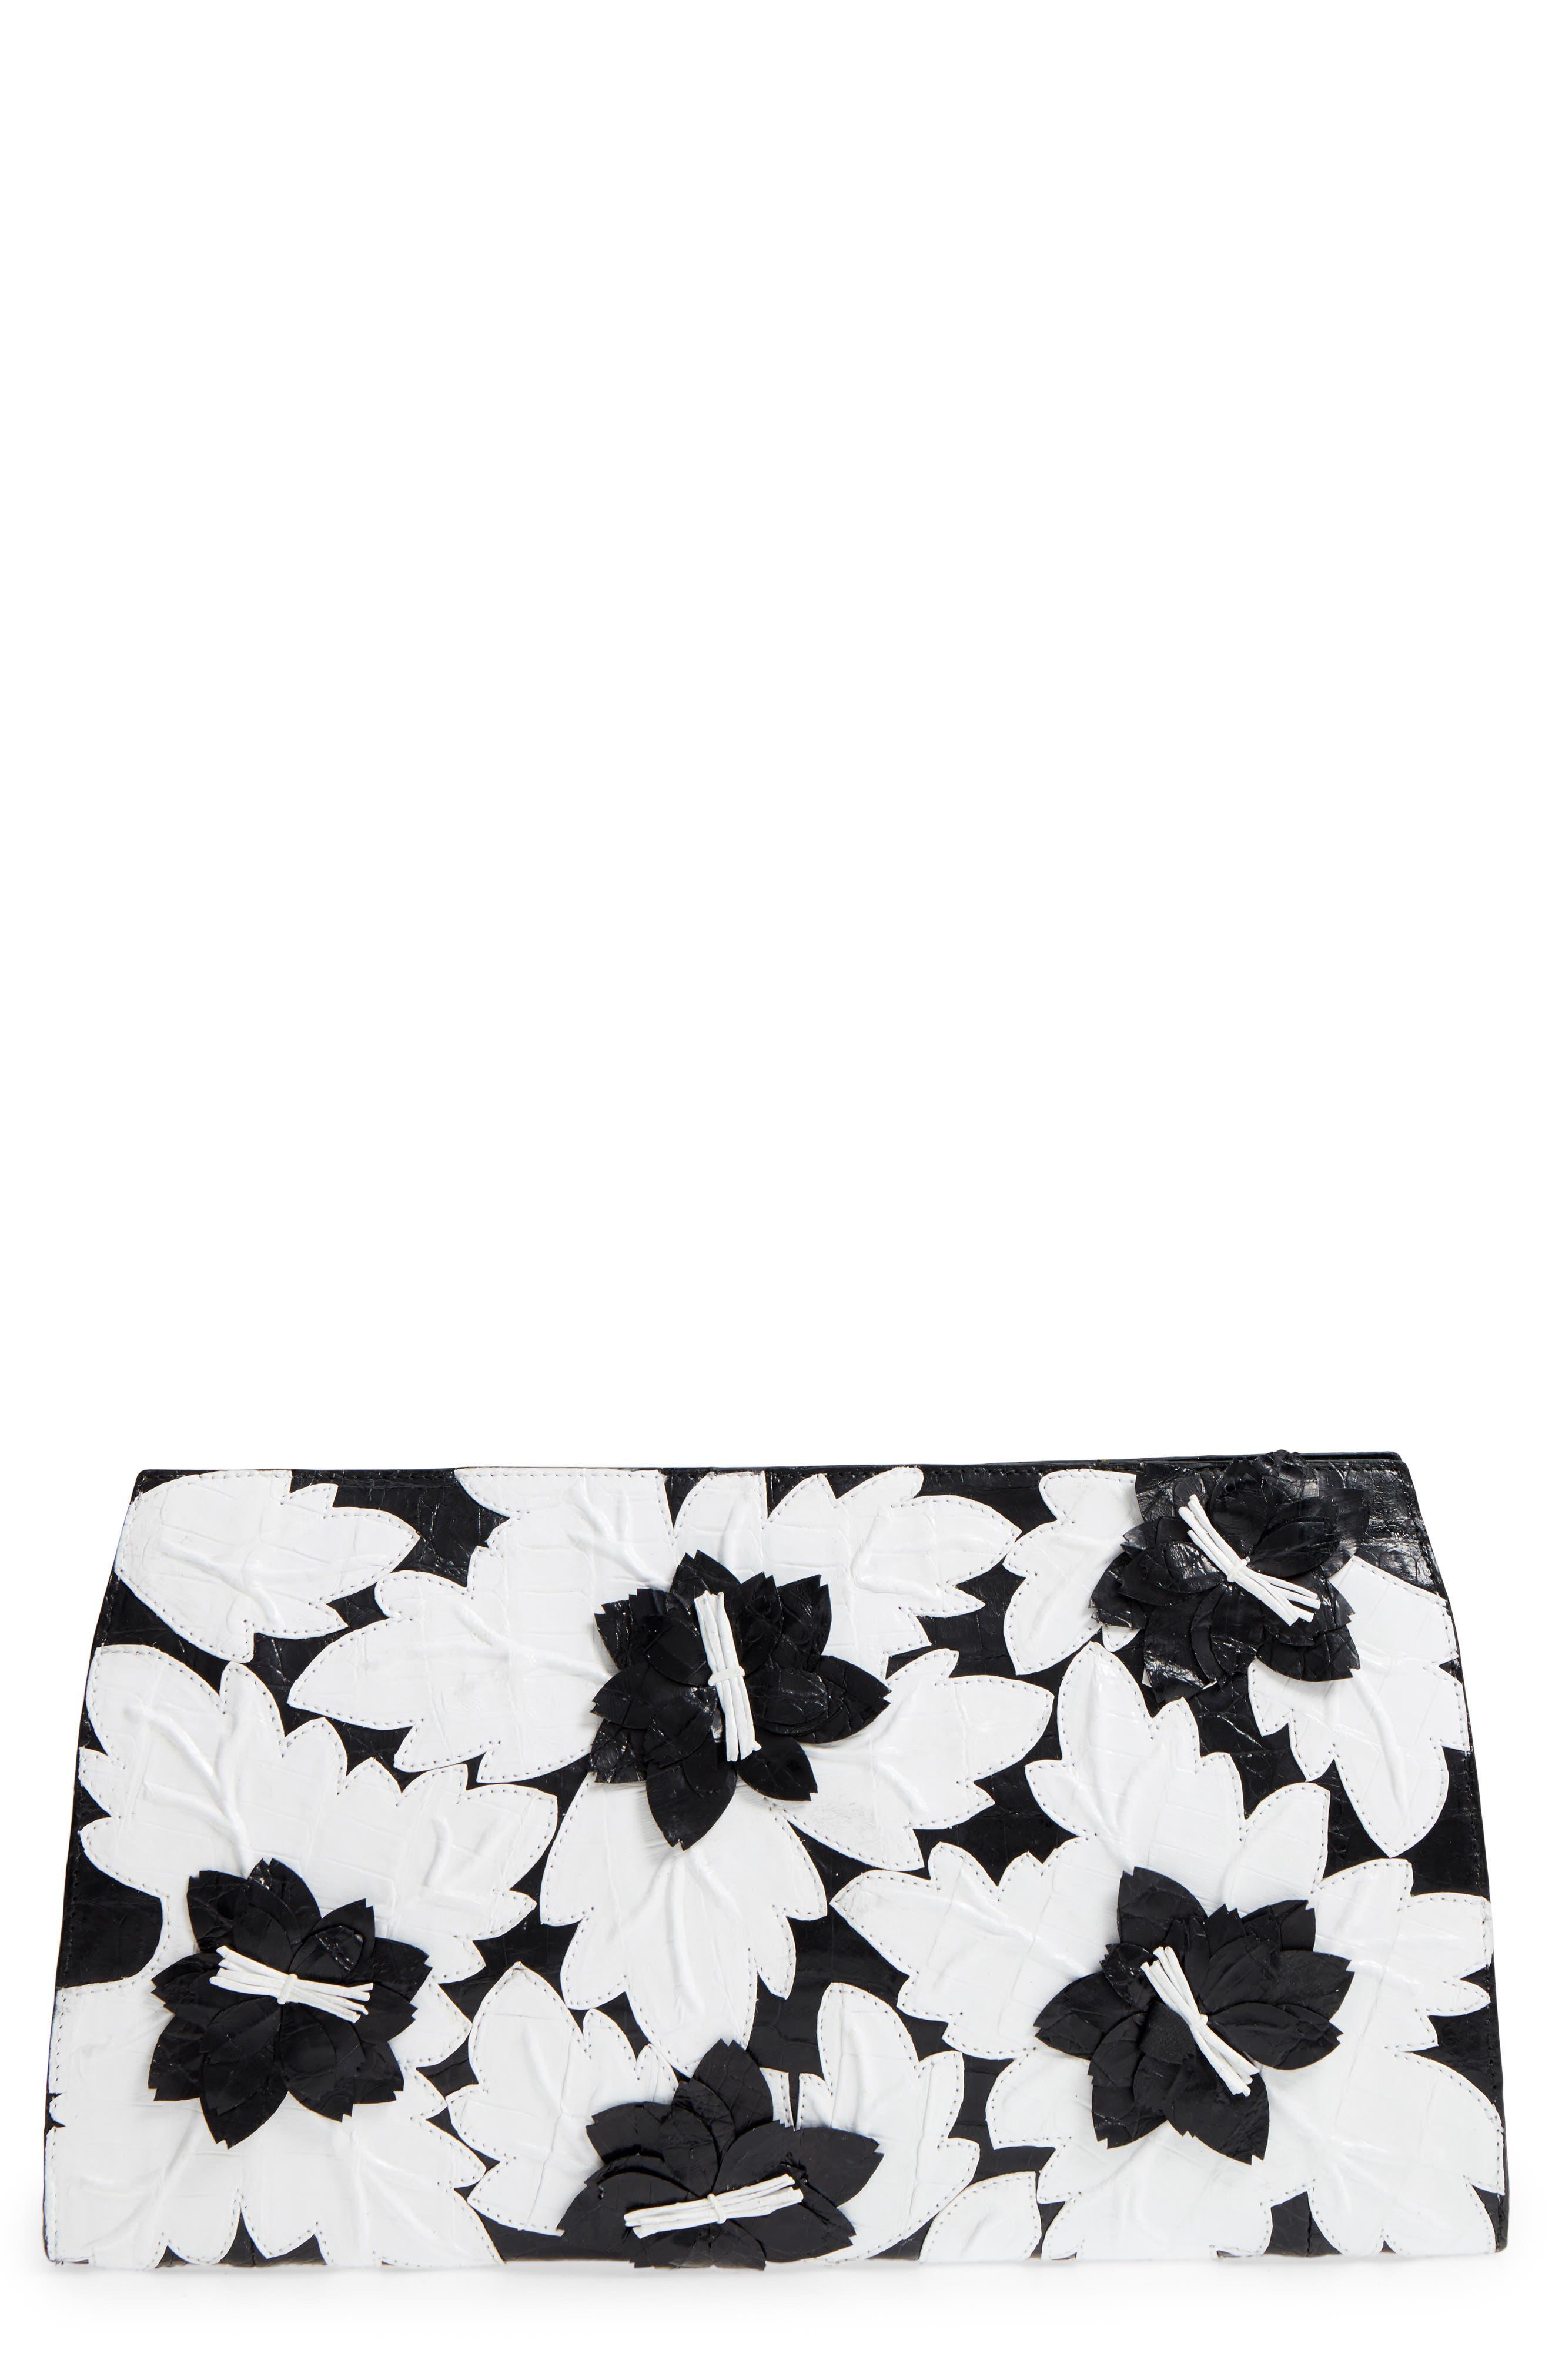 Floral Embellished Genuine Crocodile Clutch - Black, Black/ White